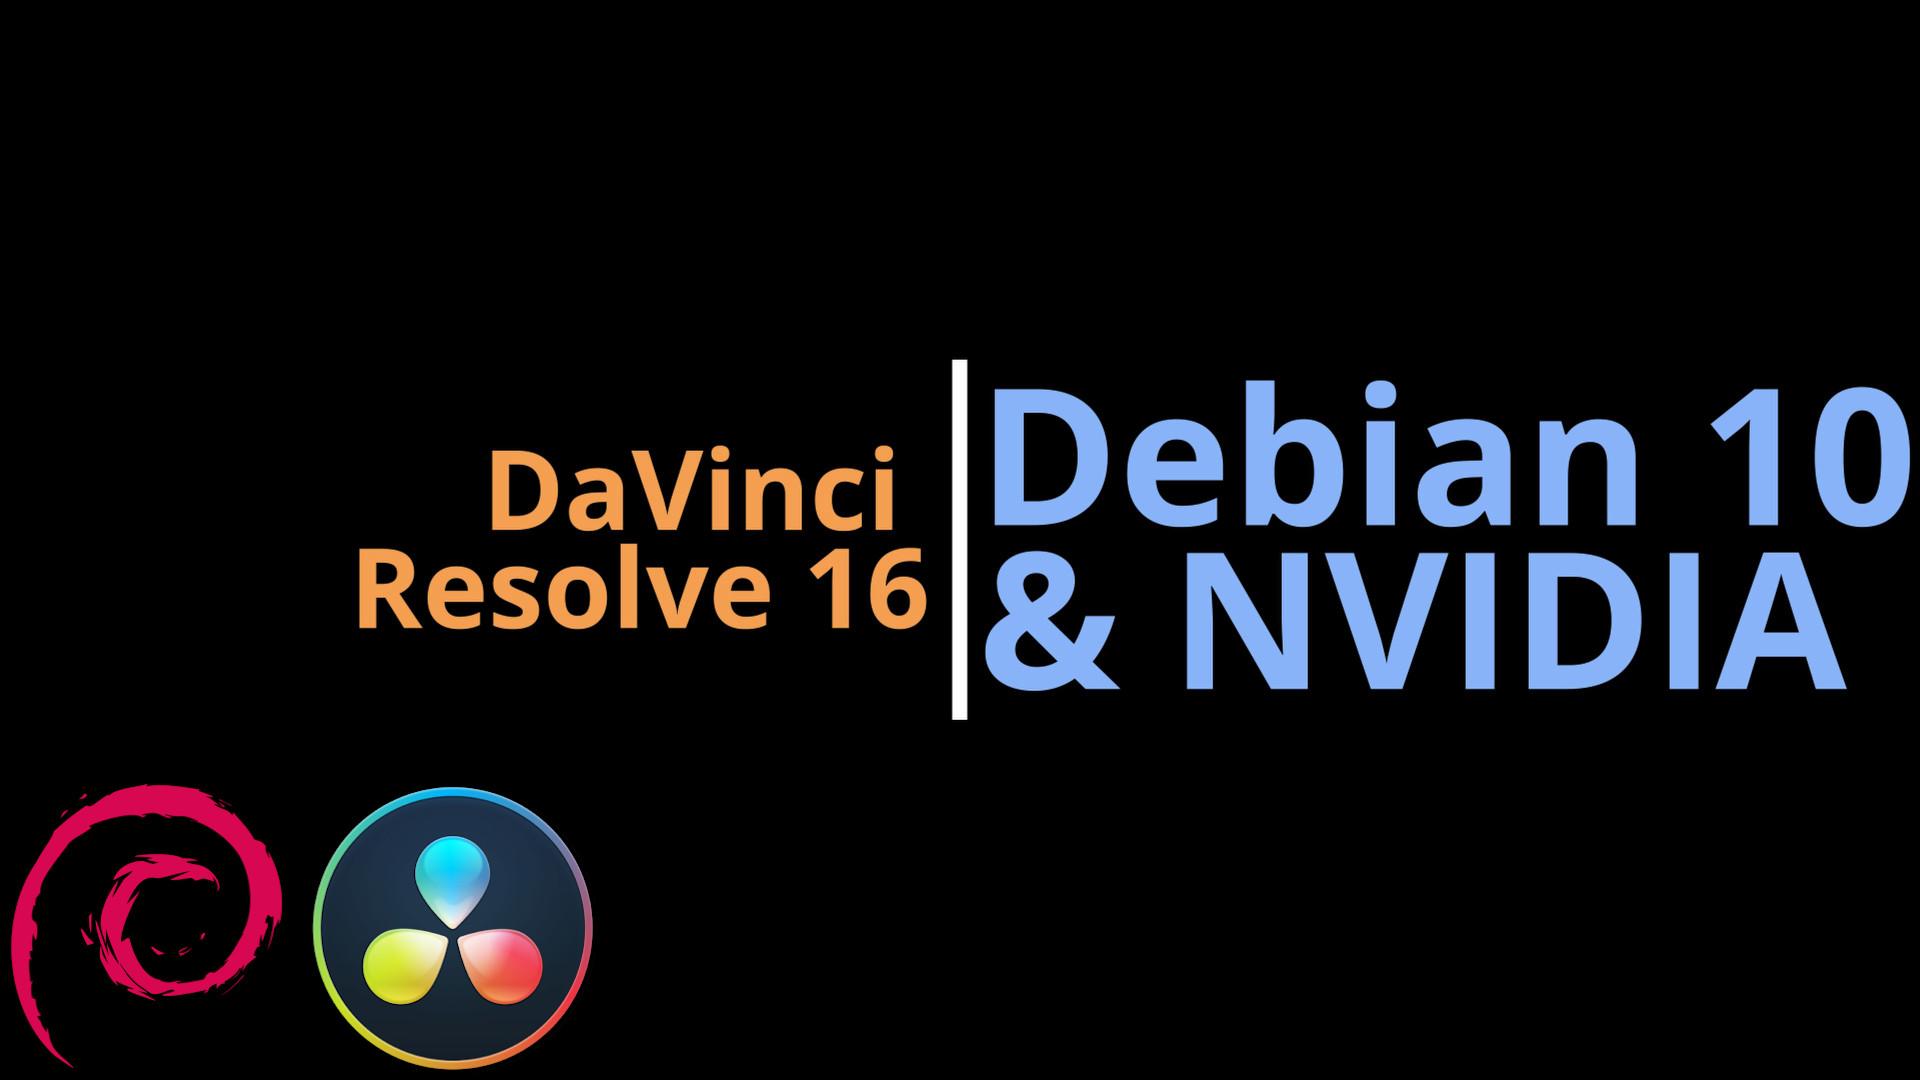 Install DaVinci Resolve 16 On Debian 10 (NVIDIA) – LinuxGameCast